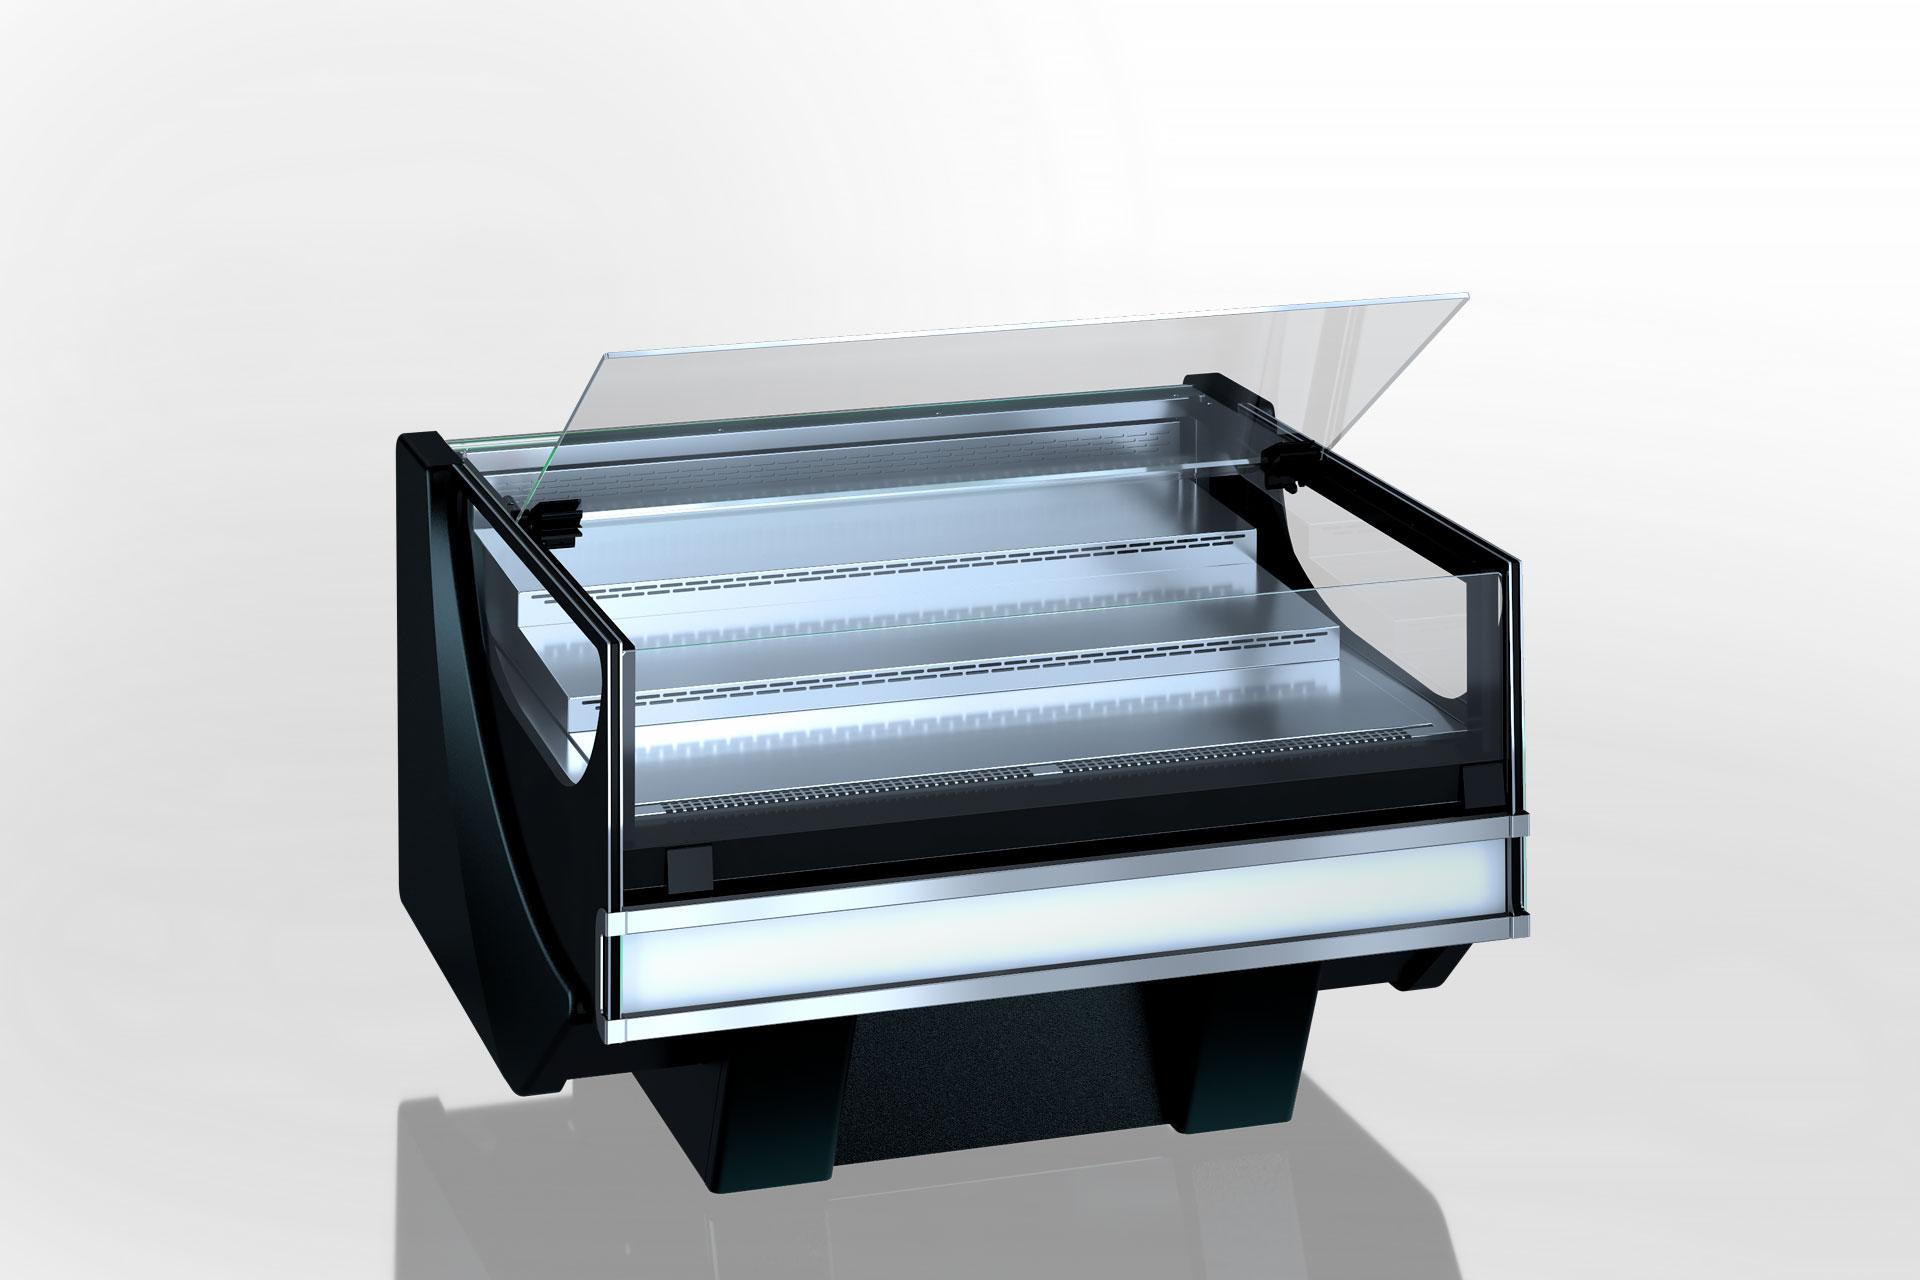 Refrigerated counters Missouri cold diamond MC 126 chocolate self 084-DLM/DLA